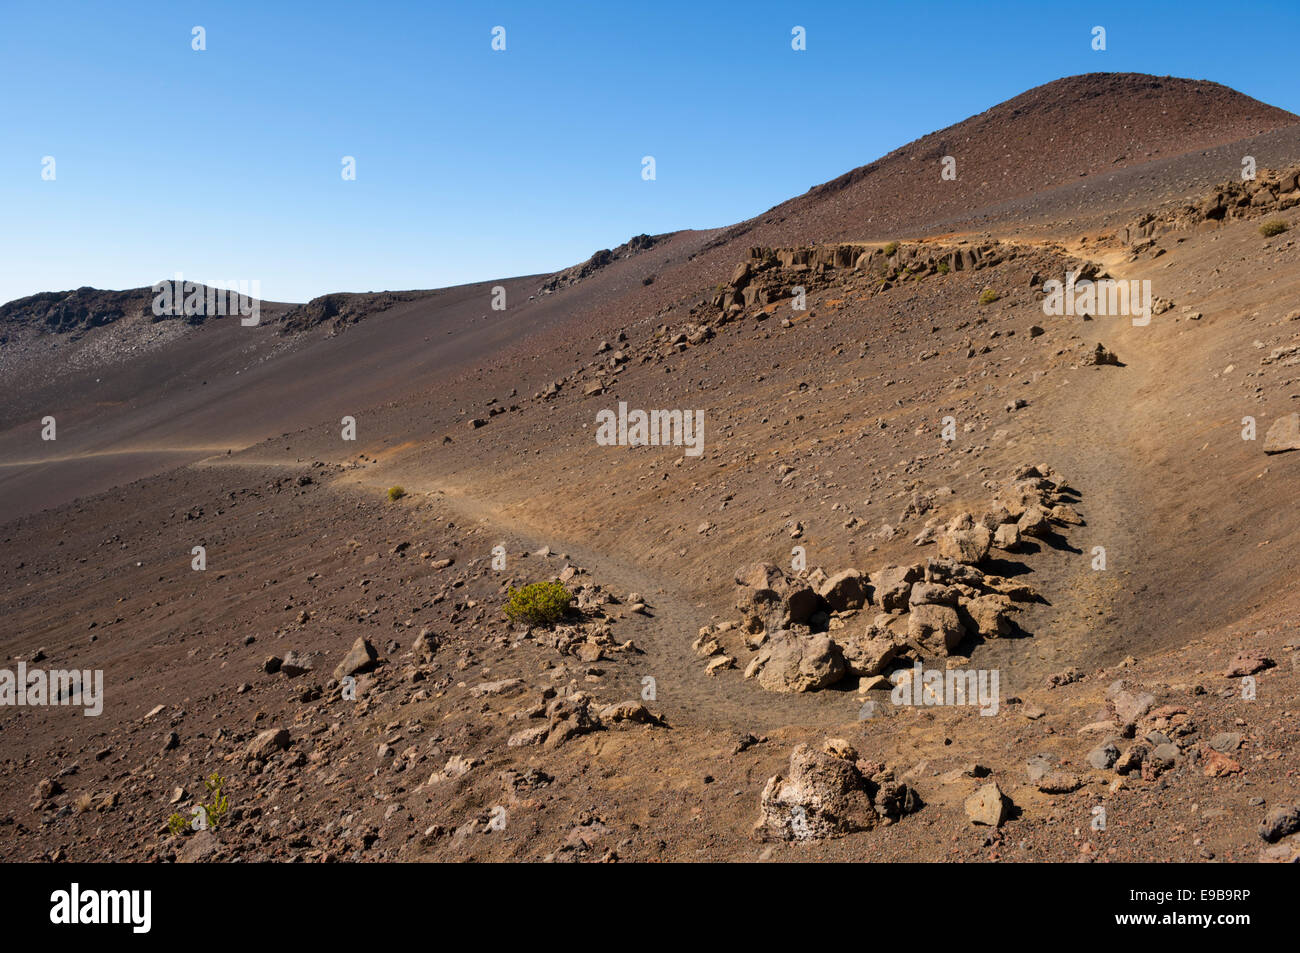 Sliding Sands Trail in Haleakala Crater; Haleakala National Park, Maui, Hawaii. - Stock Image